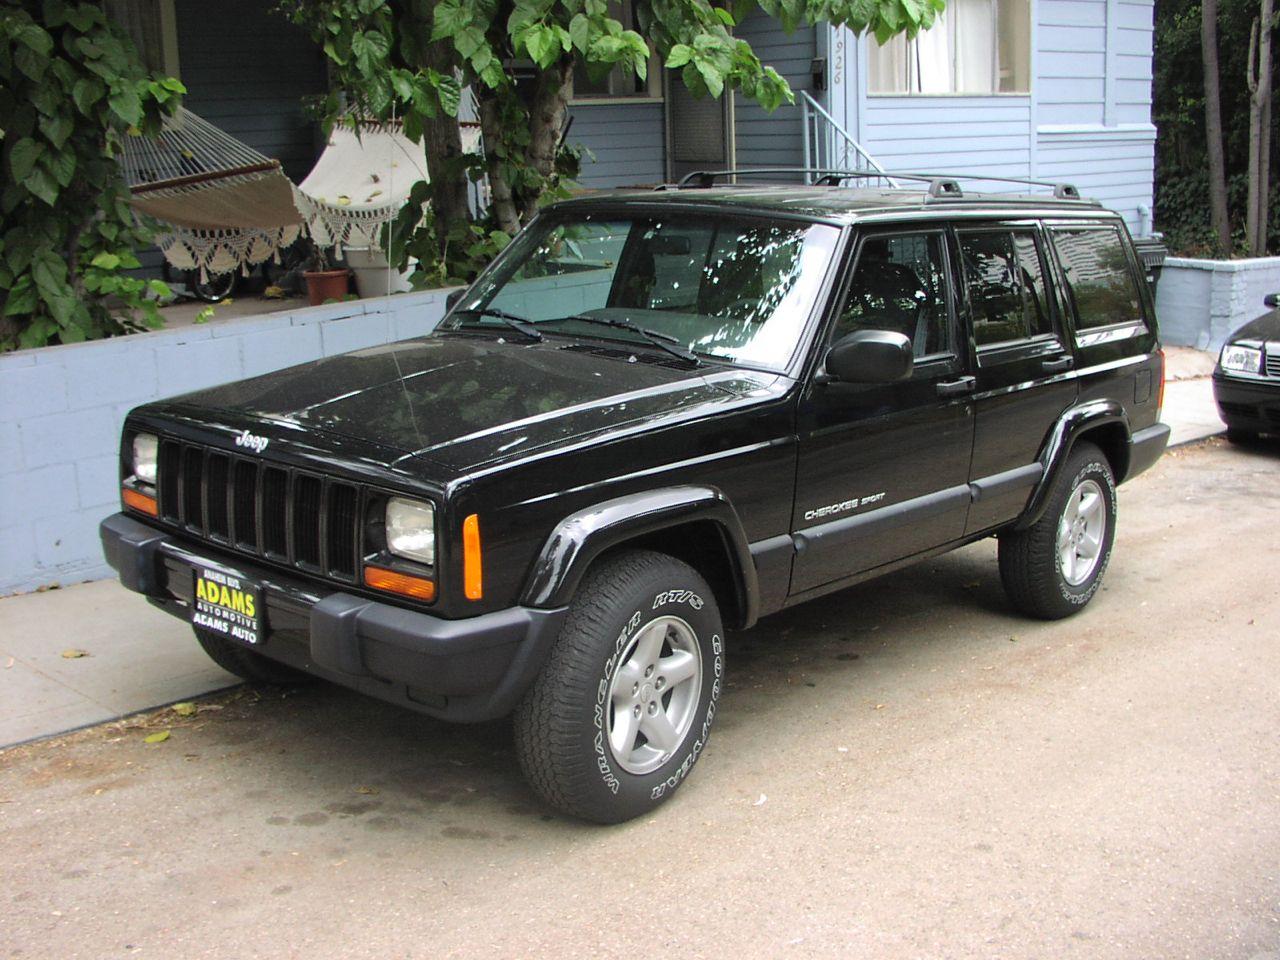 Rate my 2001 xj jeep cherokee jeepforum com